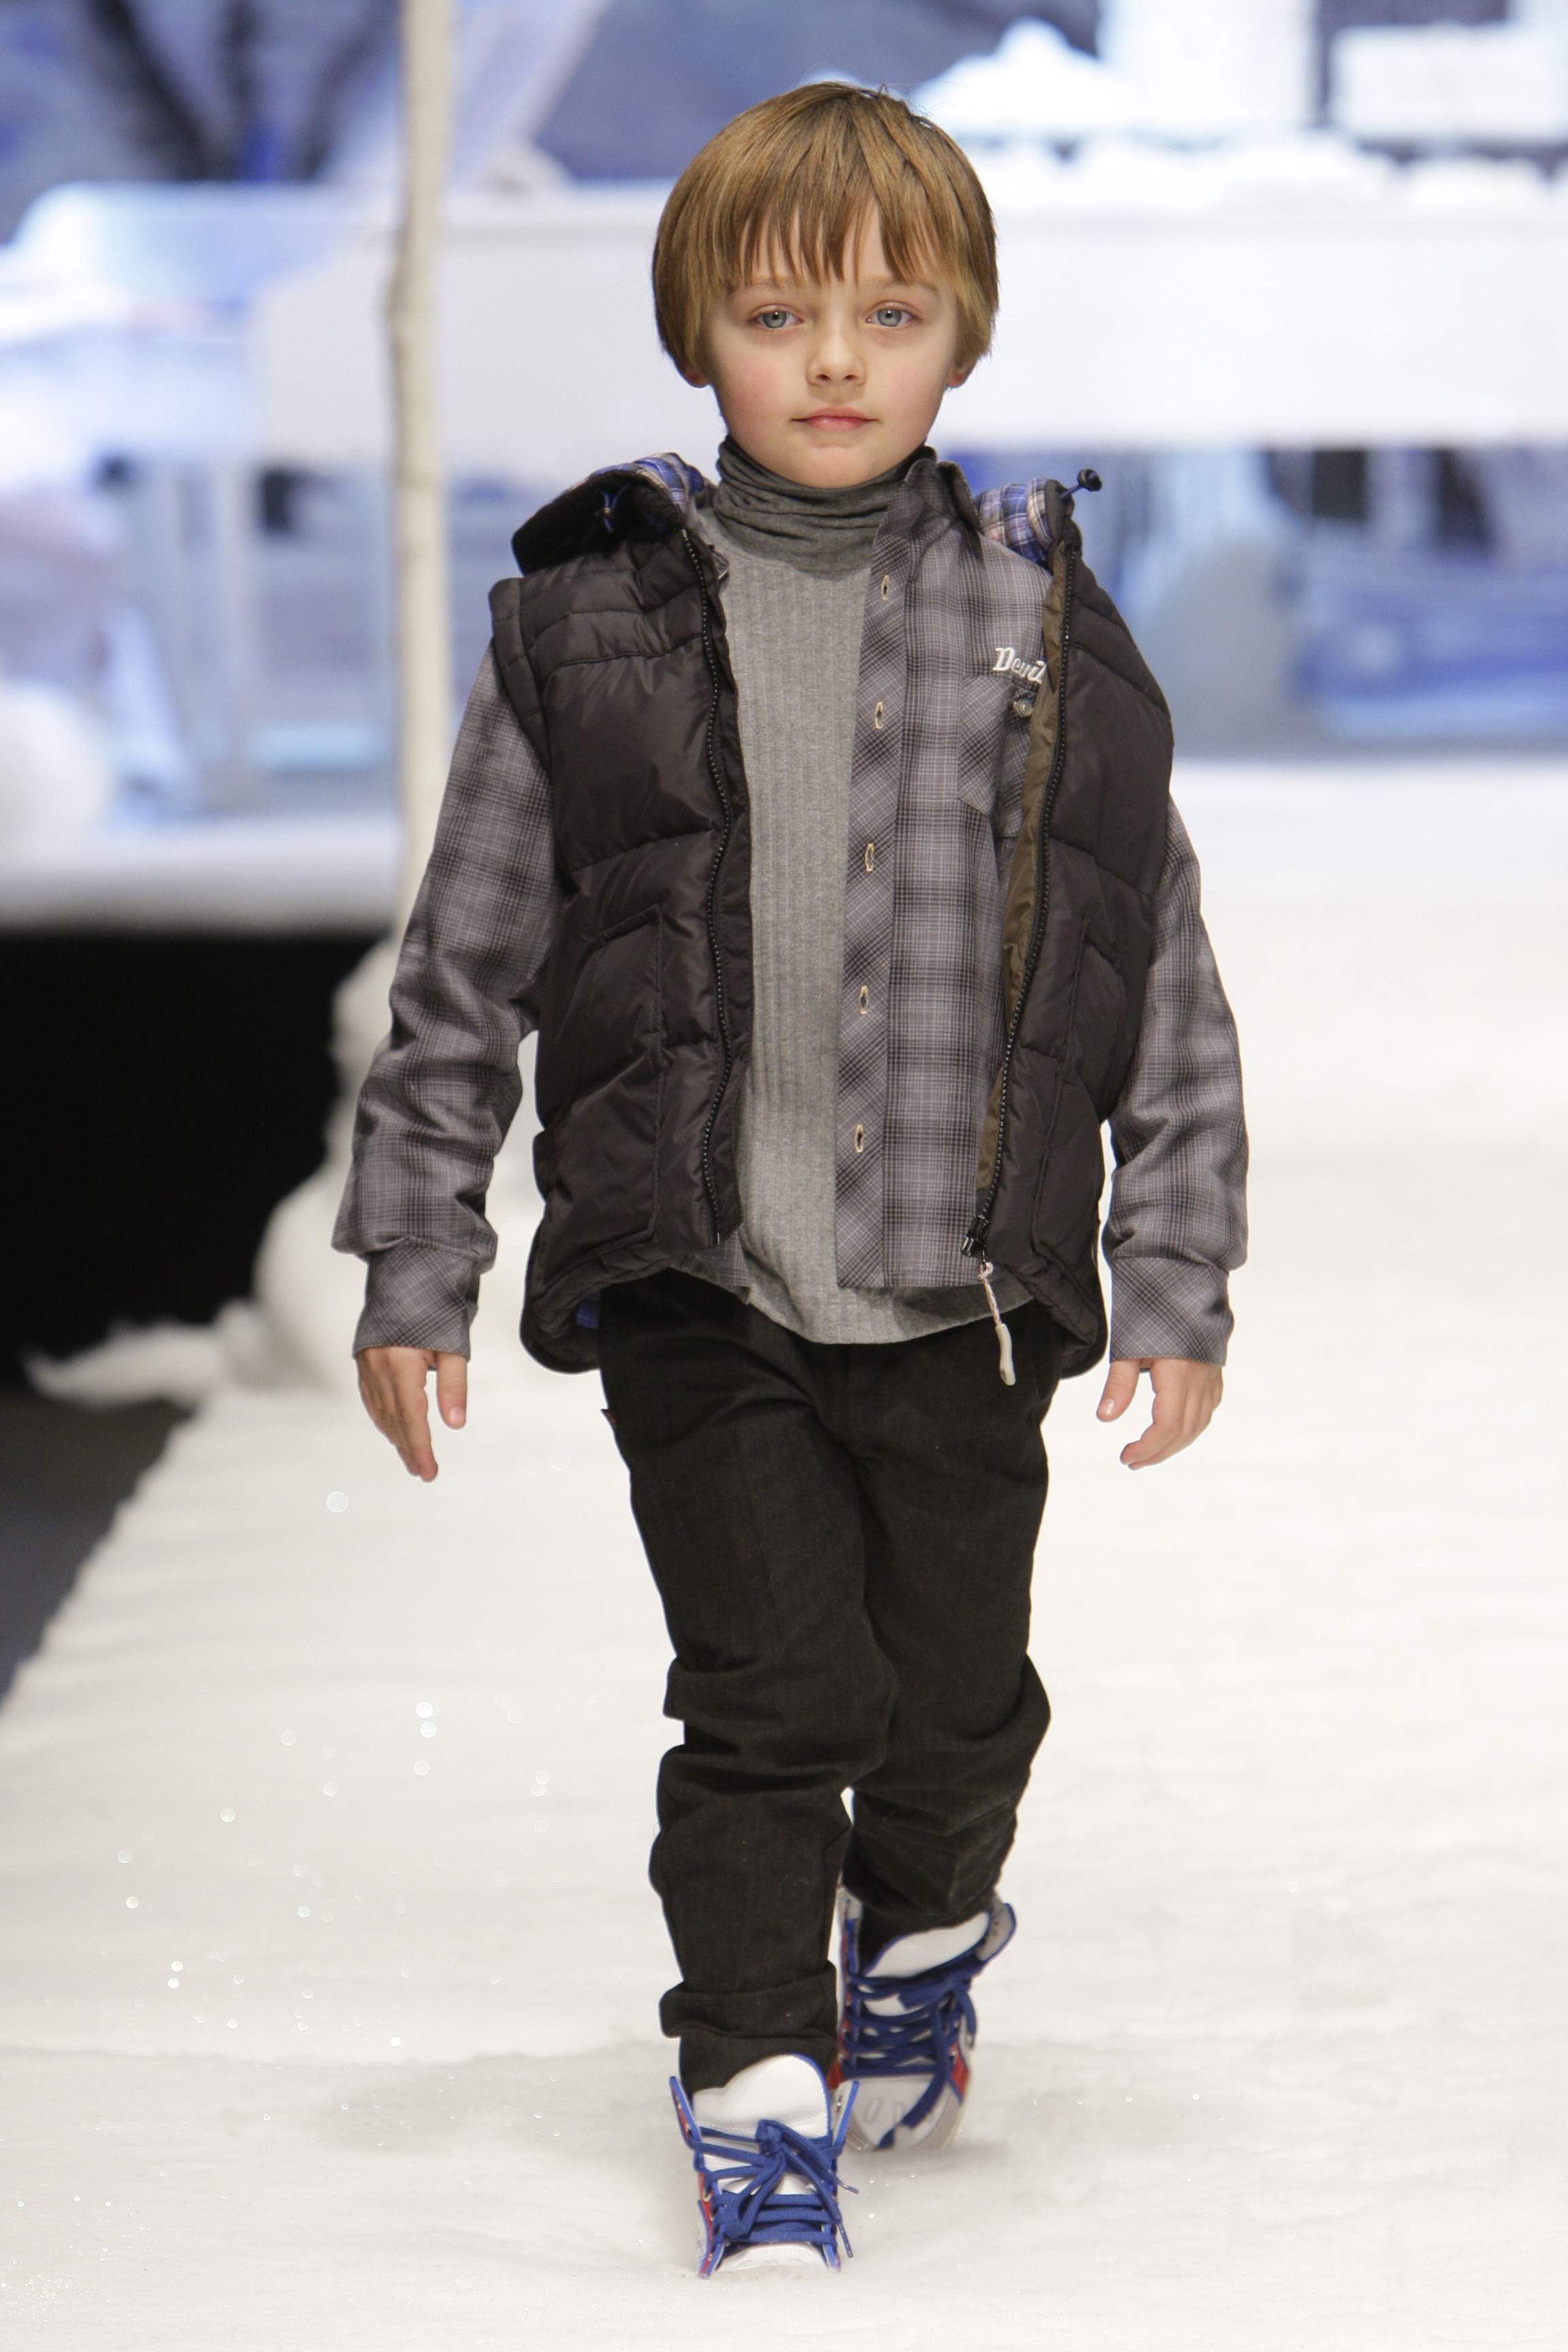 Kids fashion from Roberto Cavalli for winter 2010 0f9b3d26e